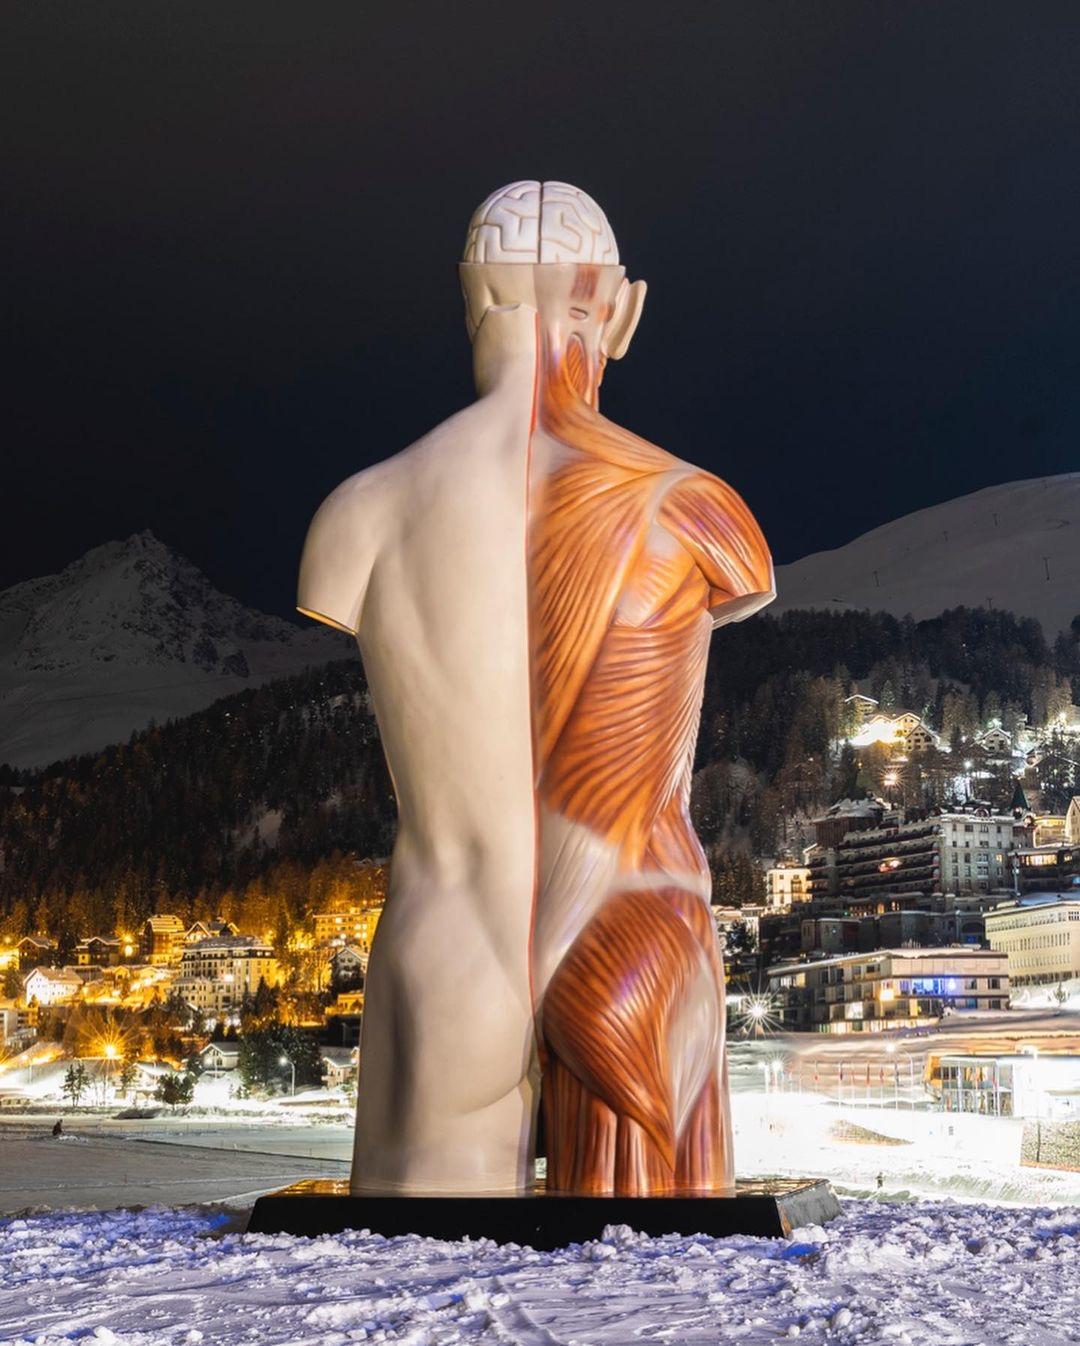 Damien Hirst, Temple, 2021, St Moritz, Dimlej (6)